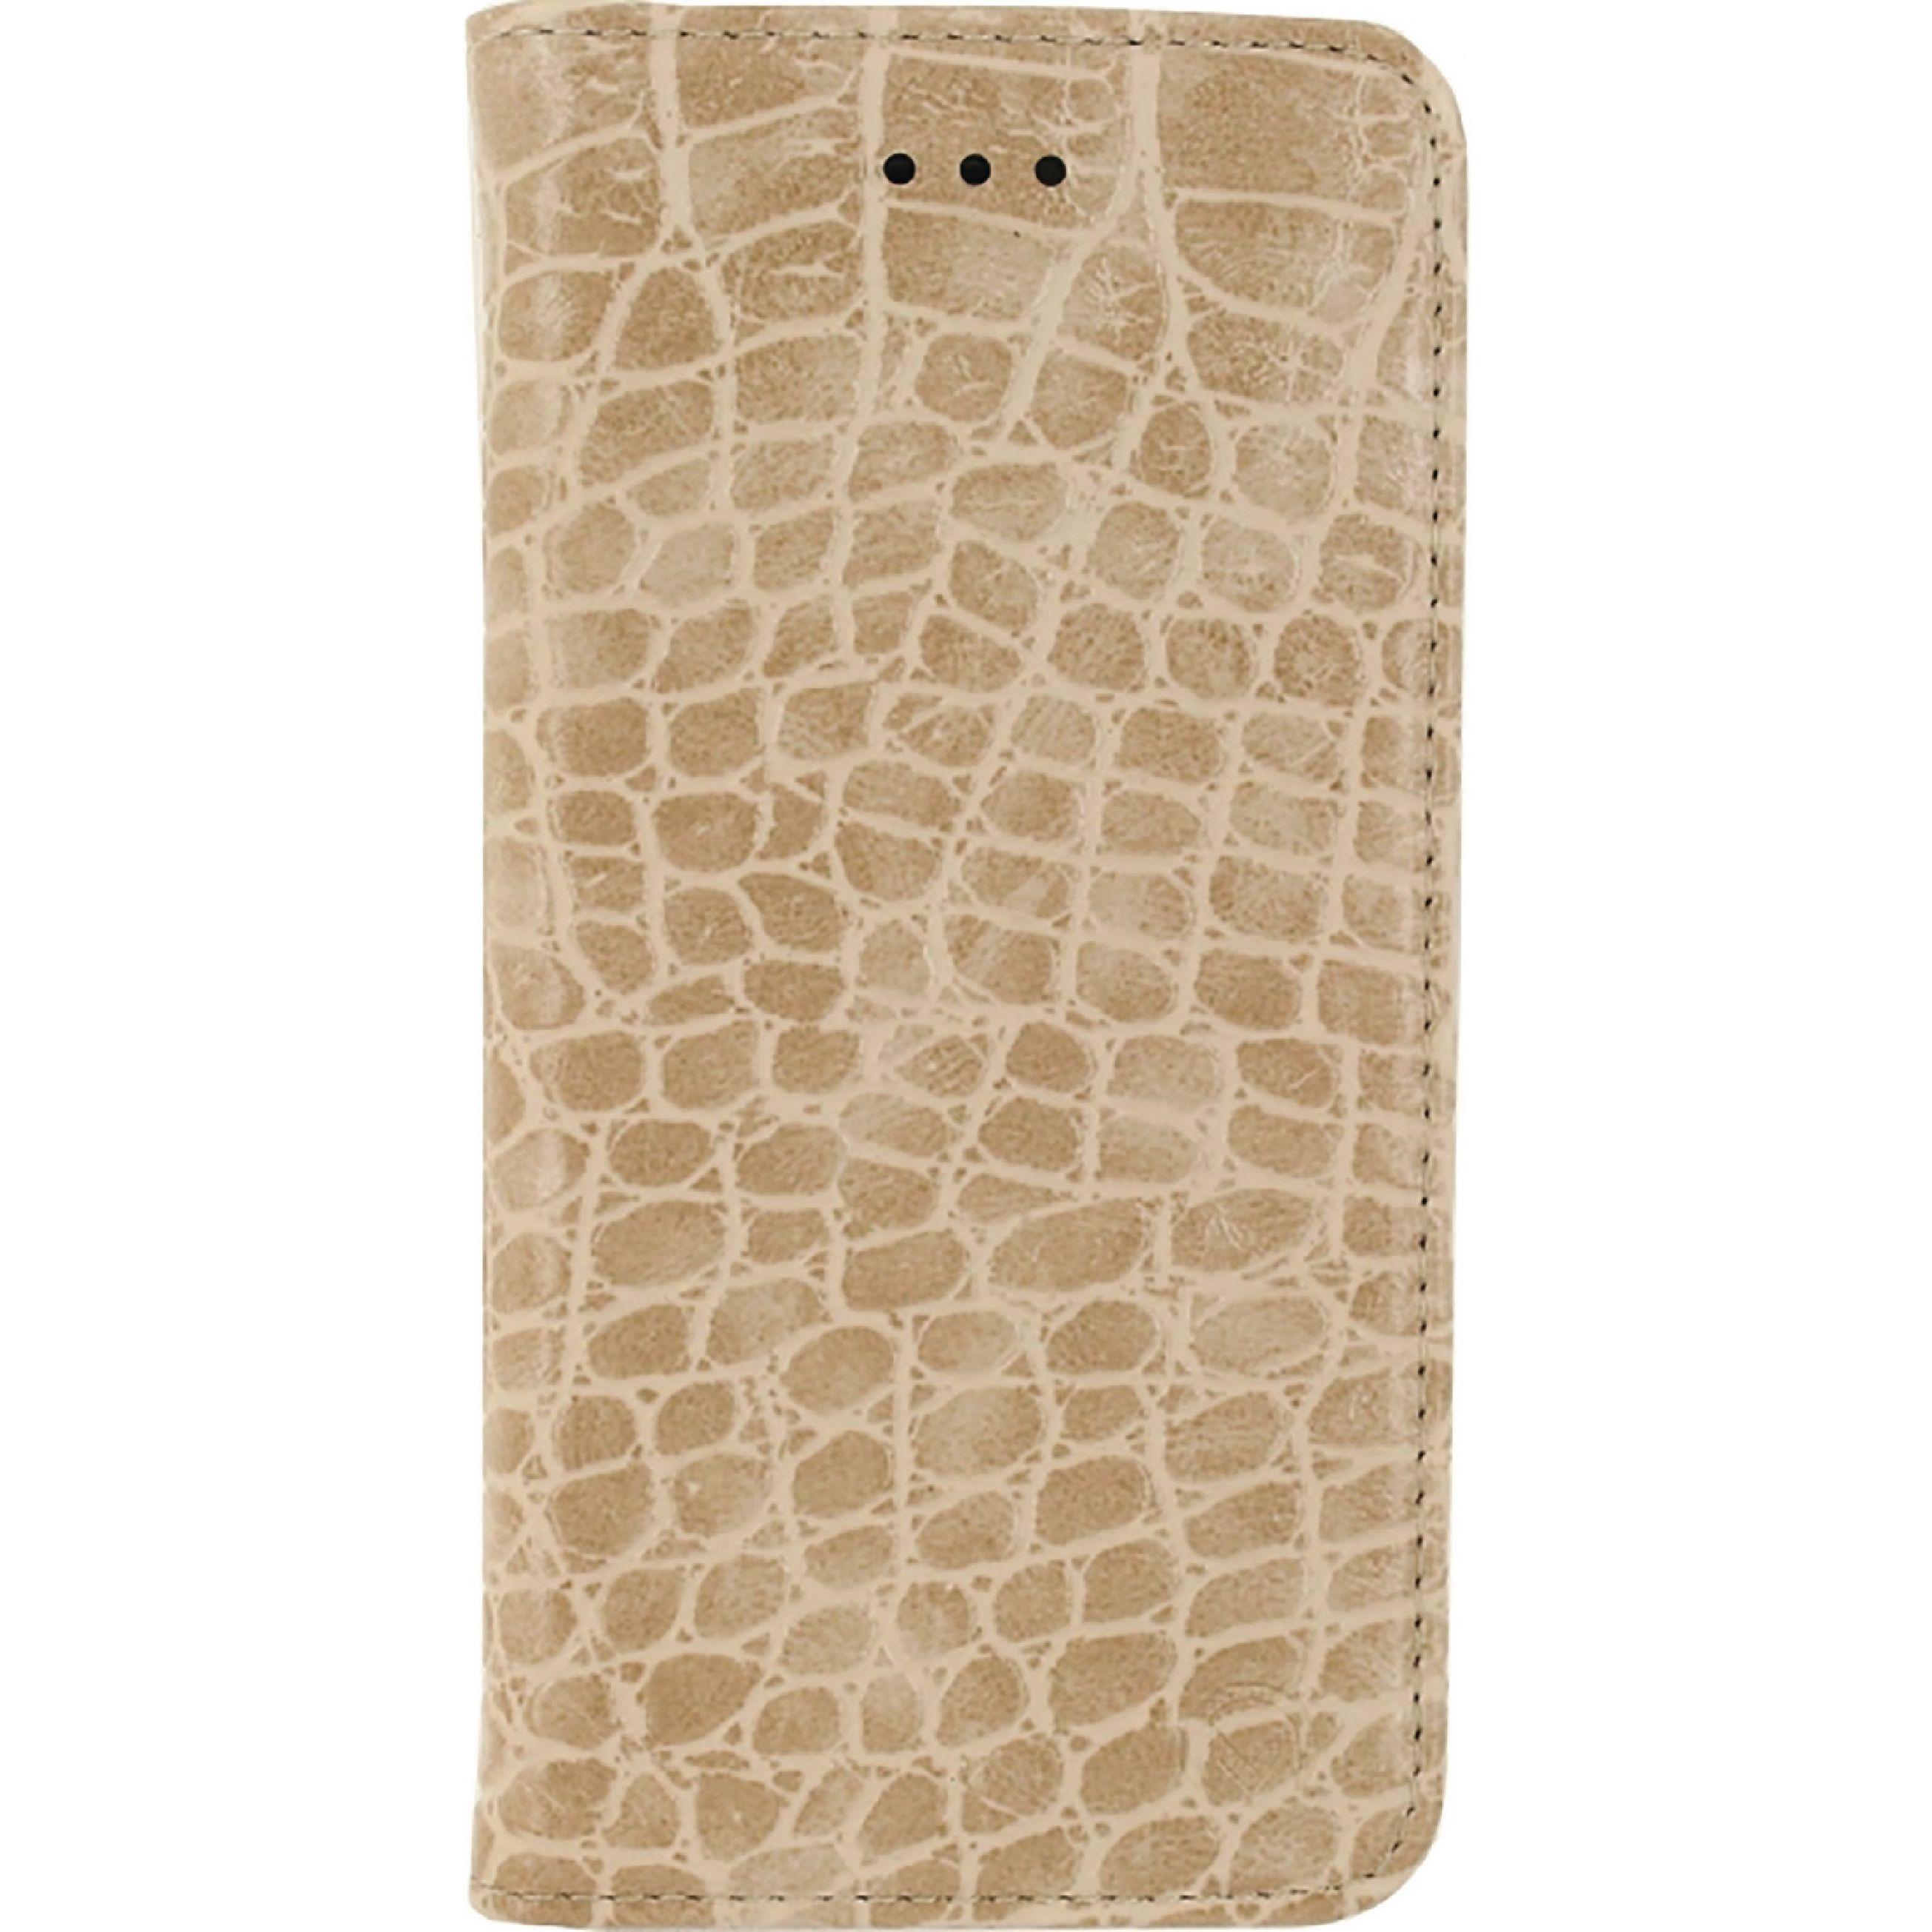 Image of   Telefon Premium Blødt Bogetui Samsung Galaxy J5 2016 Brun